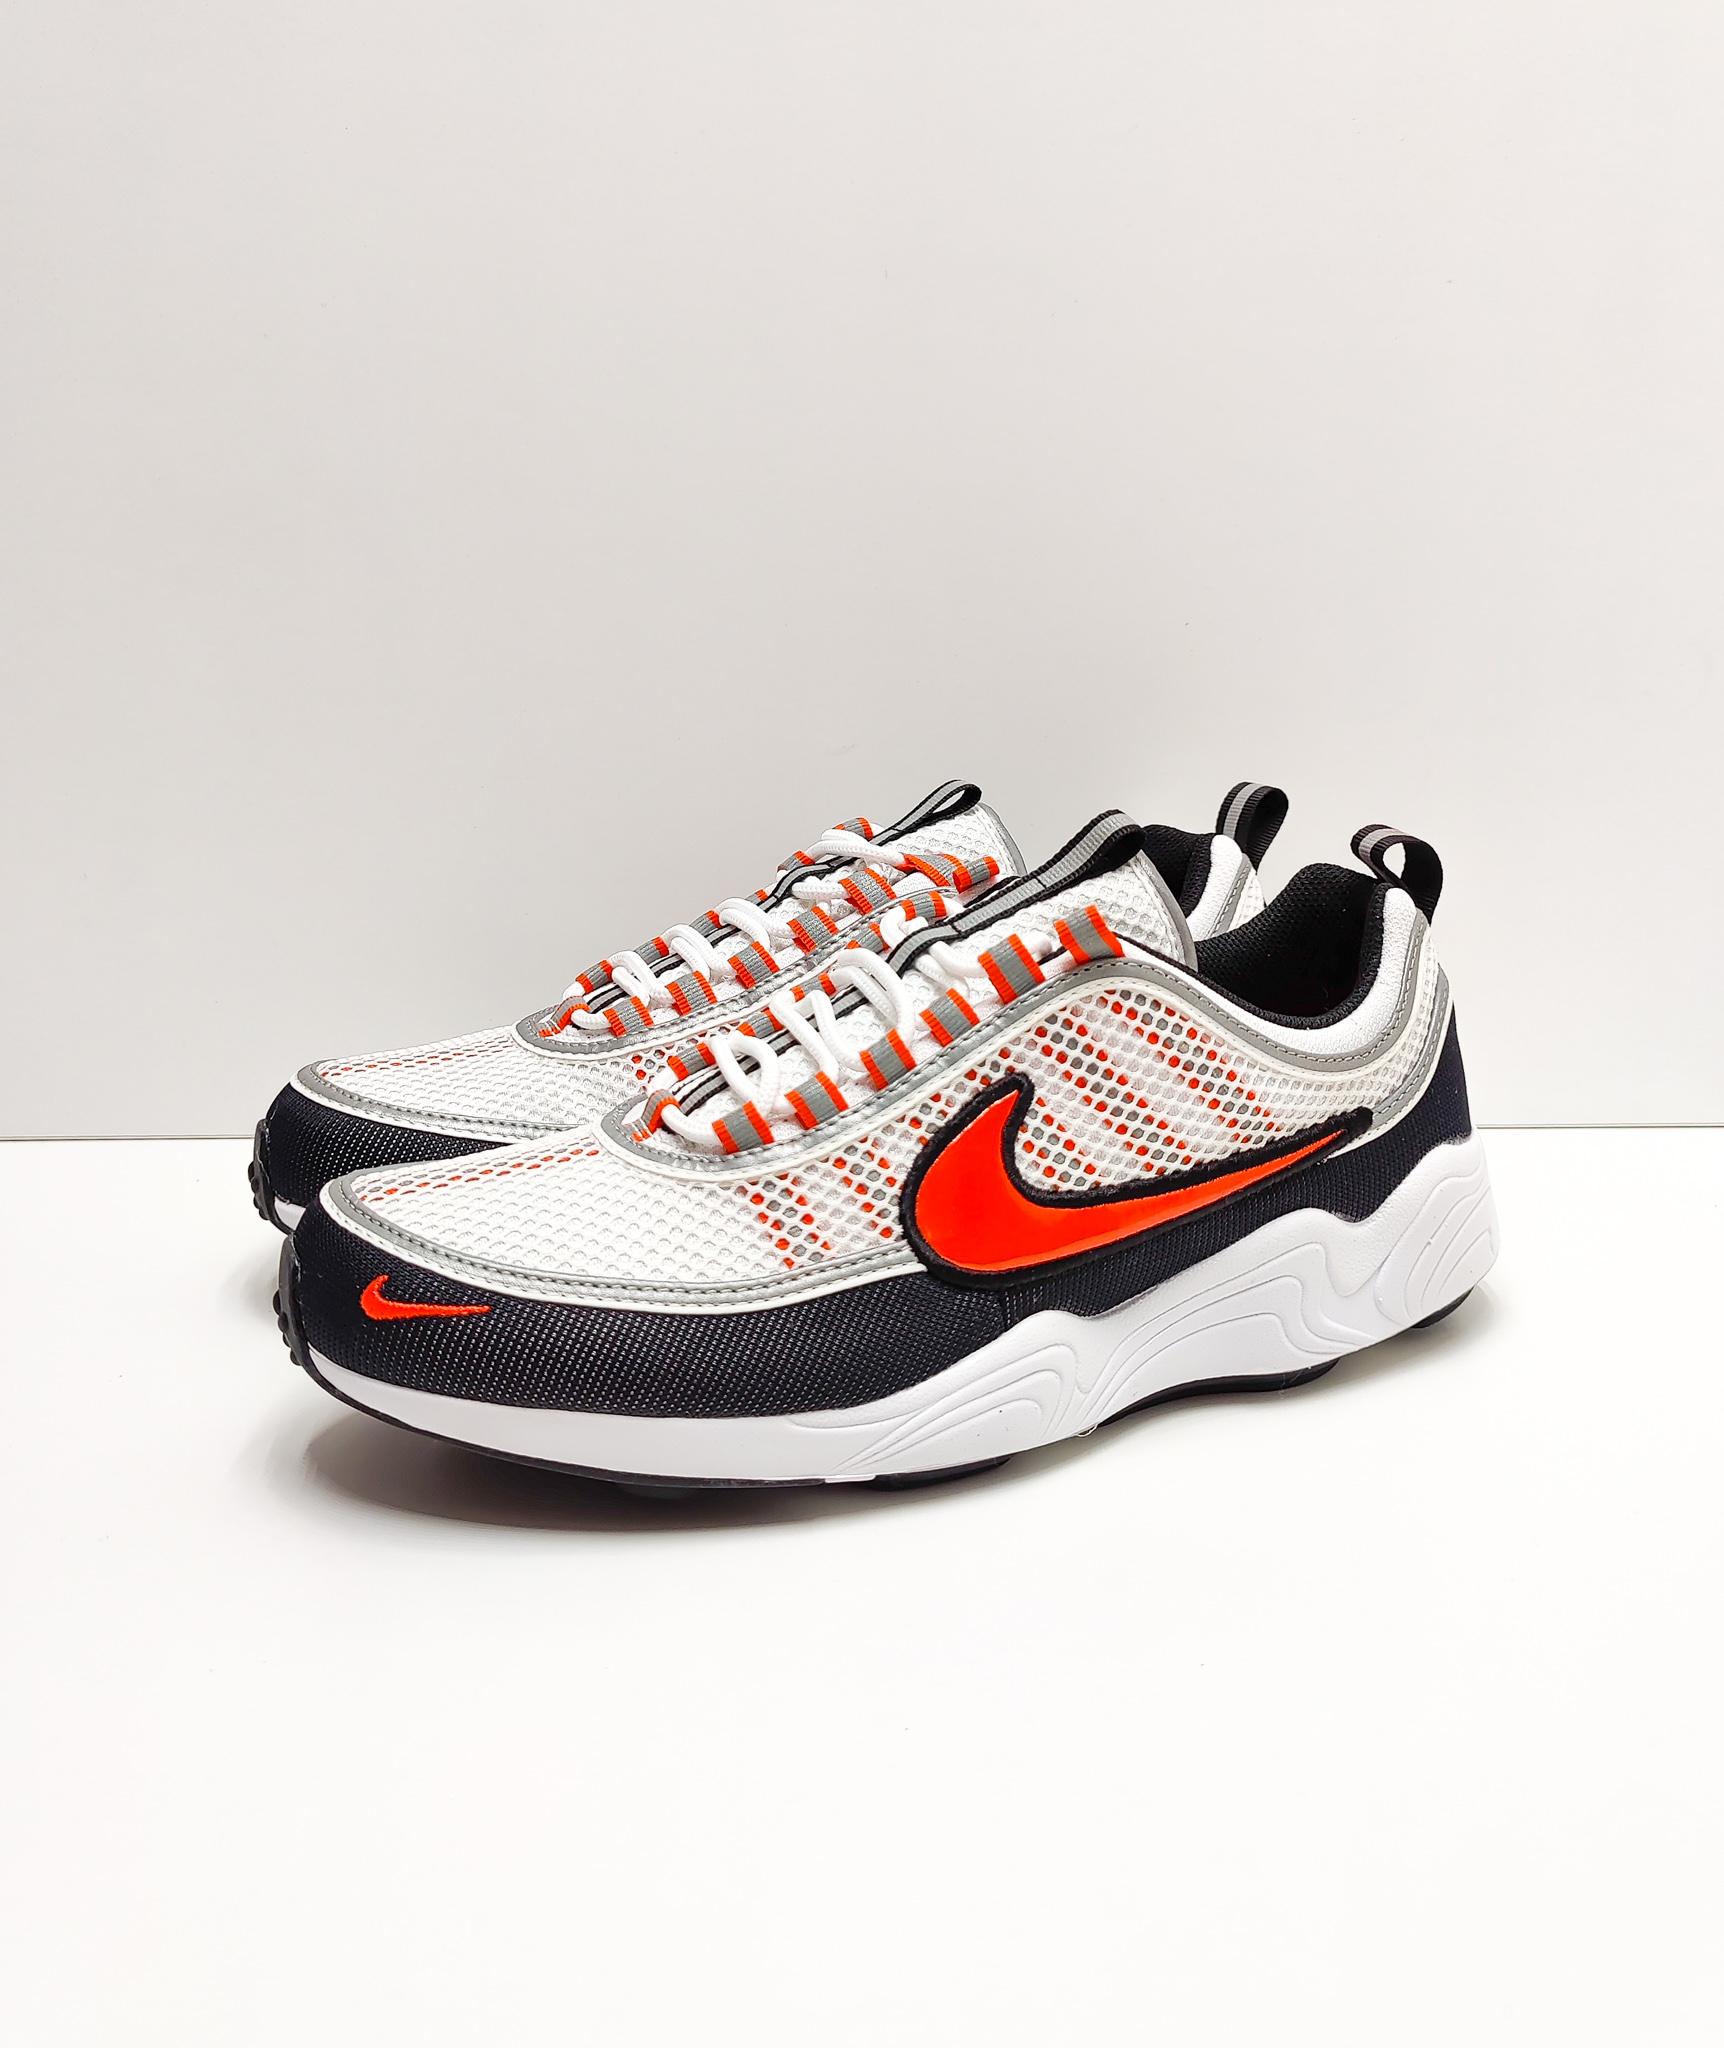 Nike Air Zoom Spiridon Team Orange